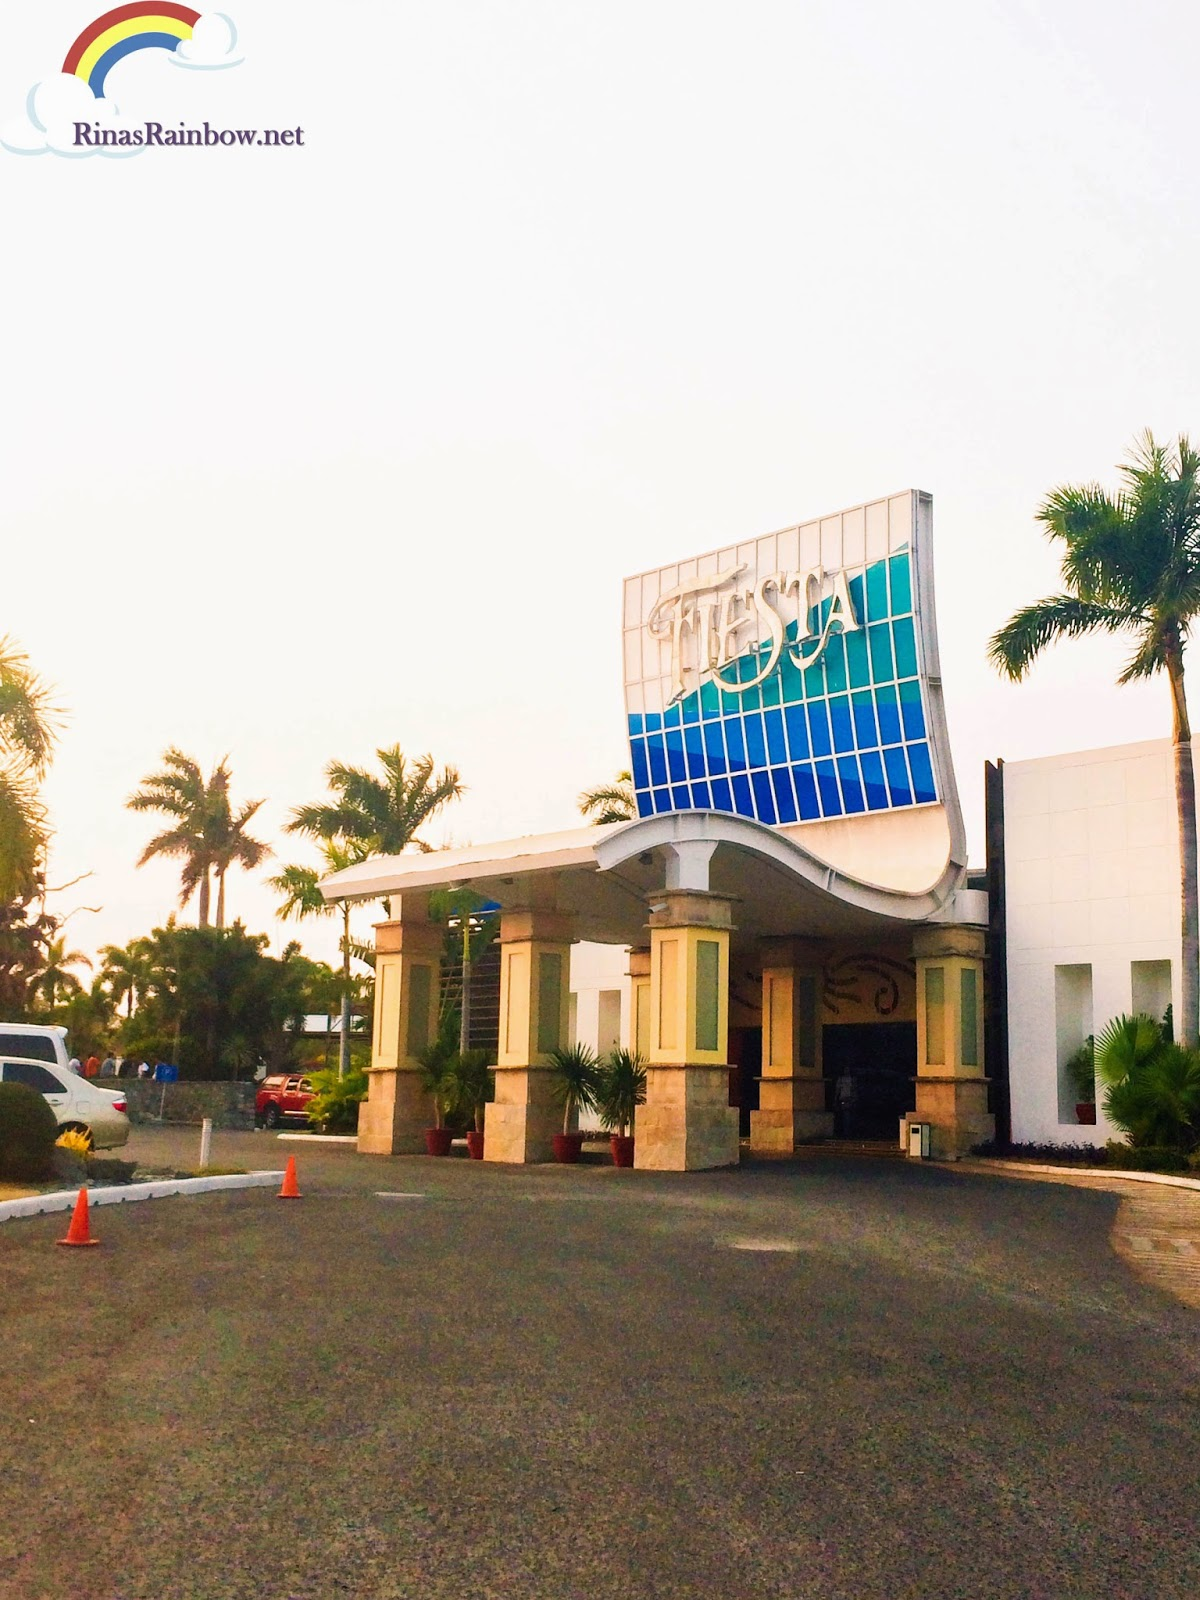 fiesta casino thunderbird resort a union